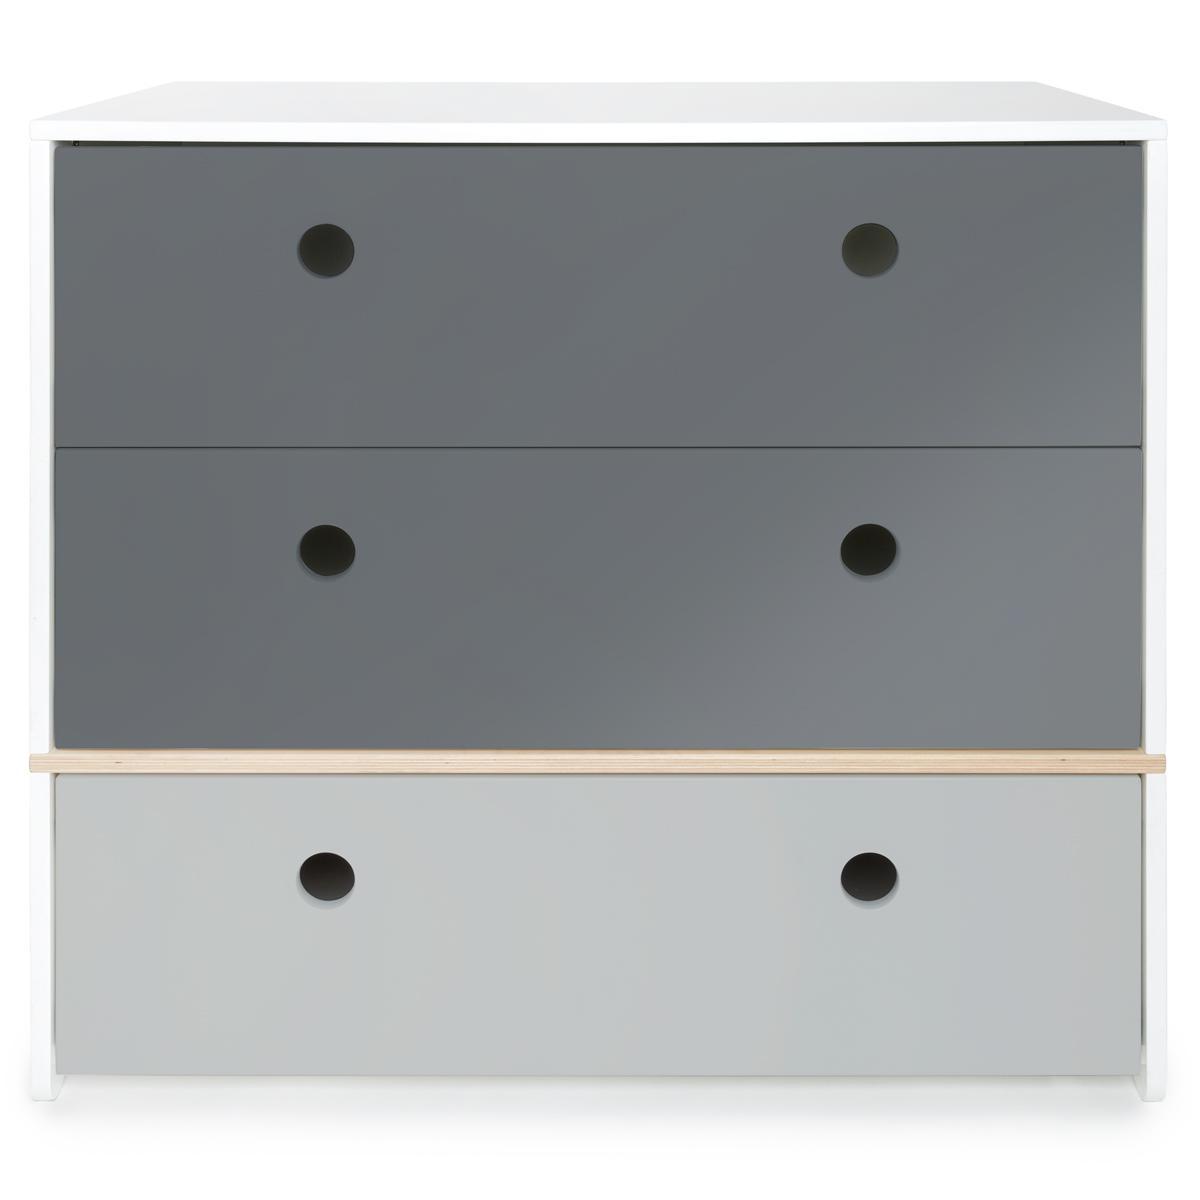 Kommode COLORFLEX Schubladen Farben space grey-space grey-pearl grey